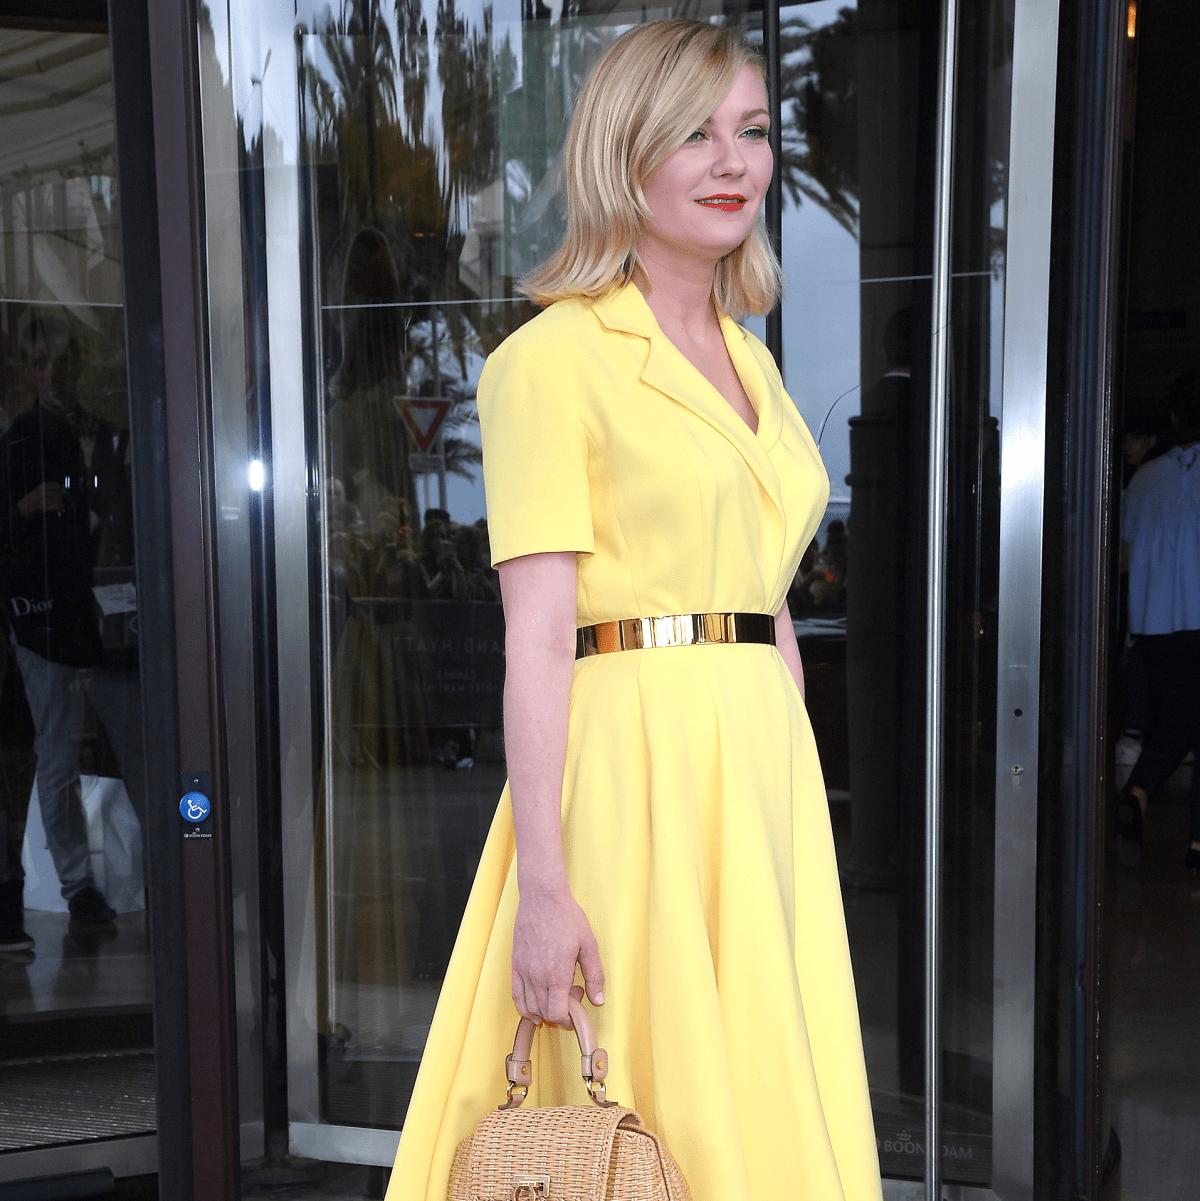 Kirsten Dunst in Dior at Cannes Film Festival